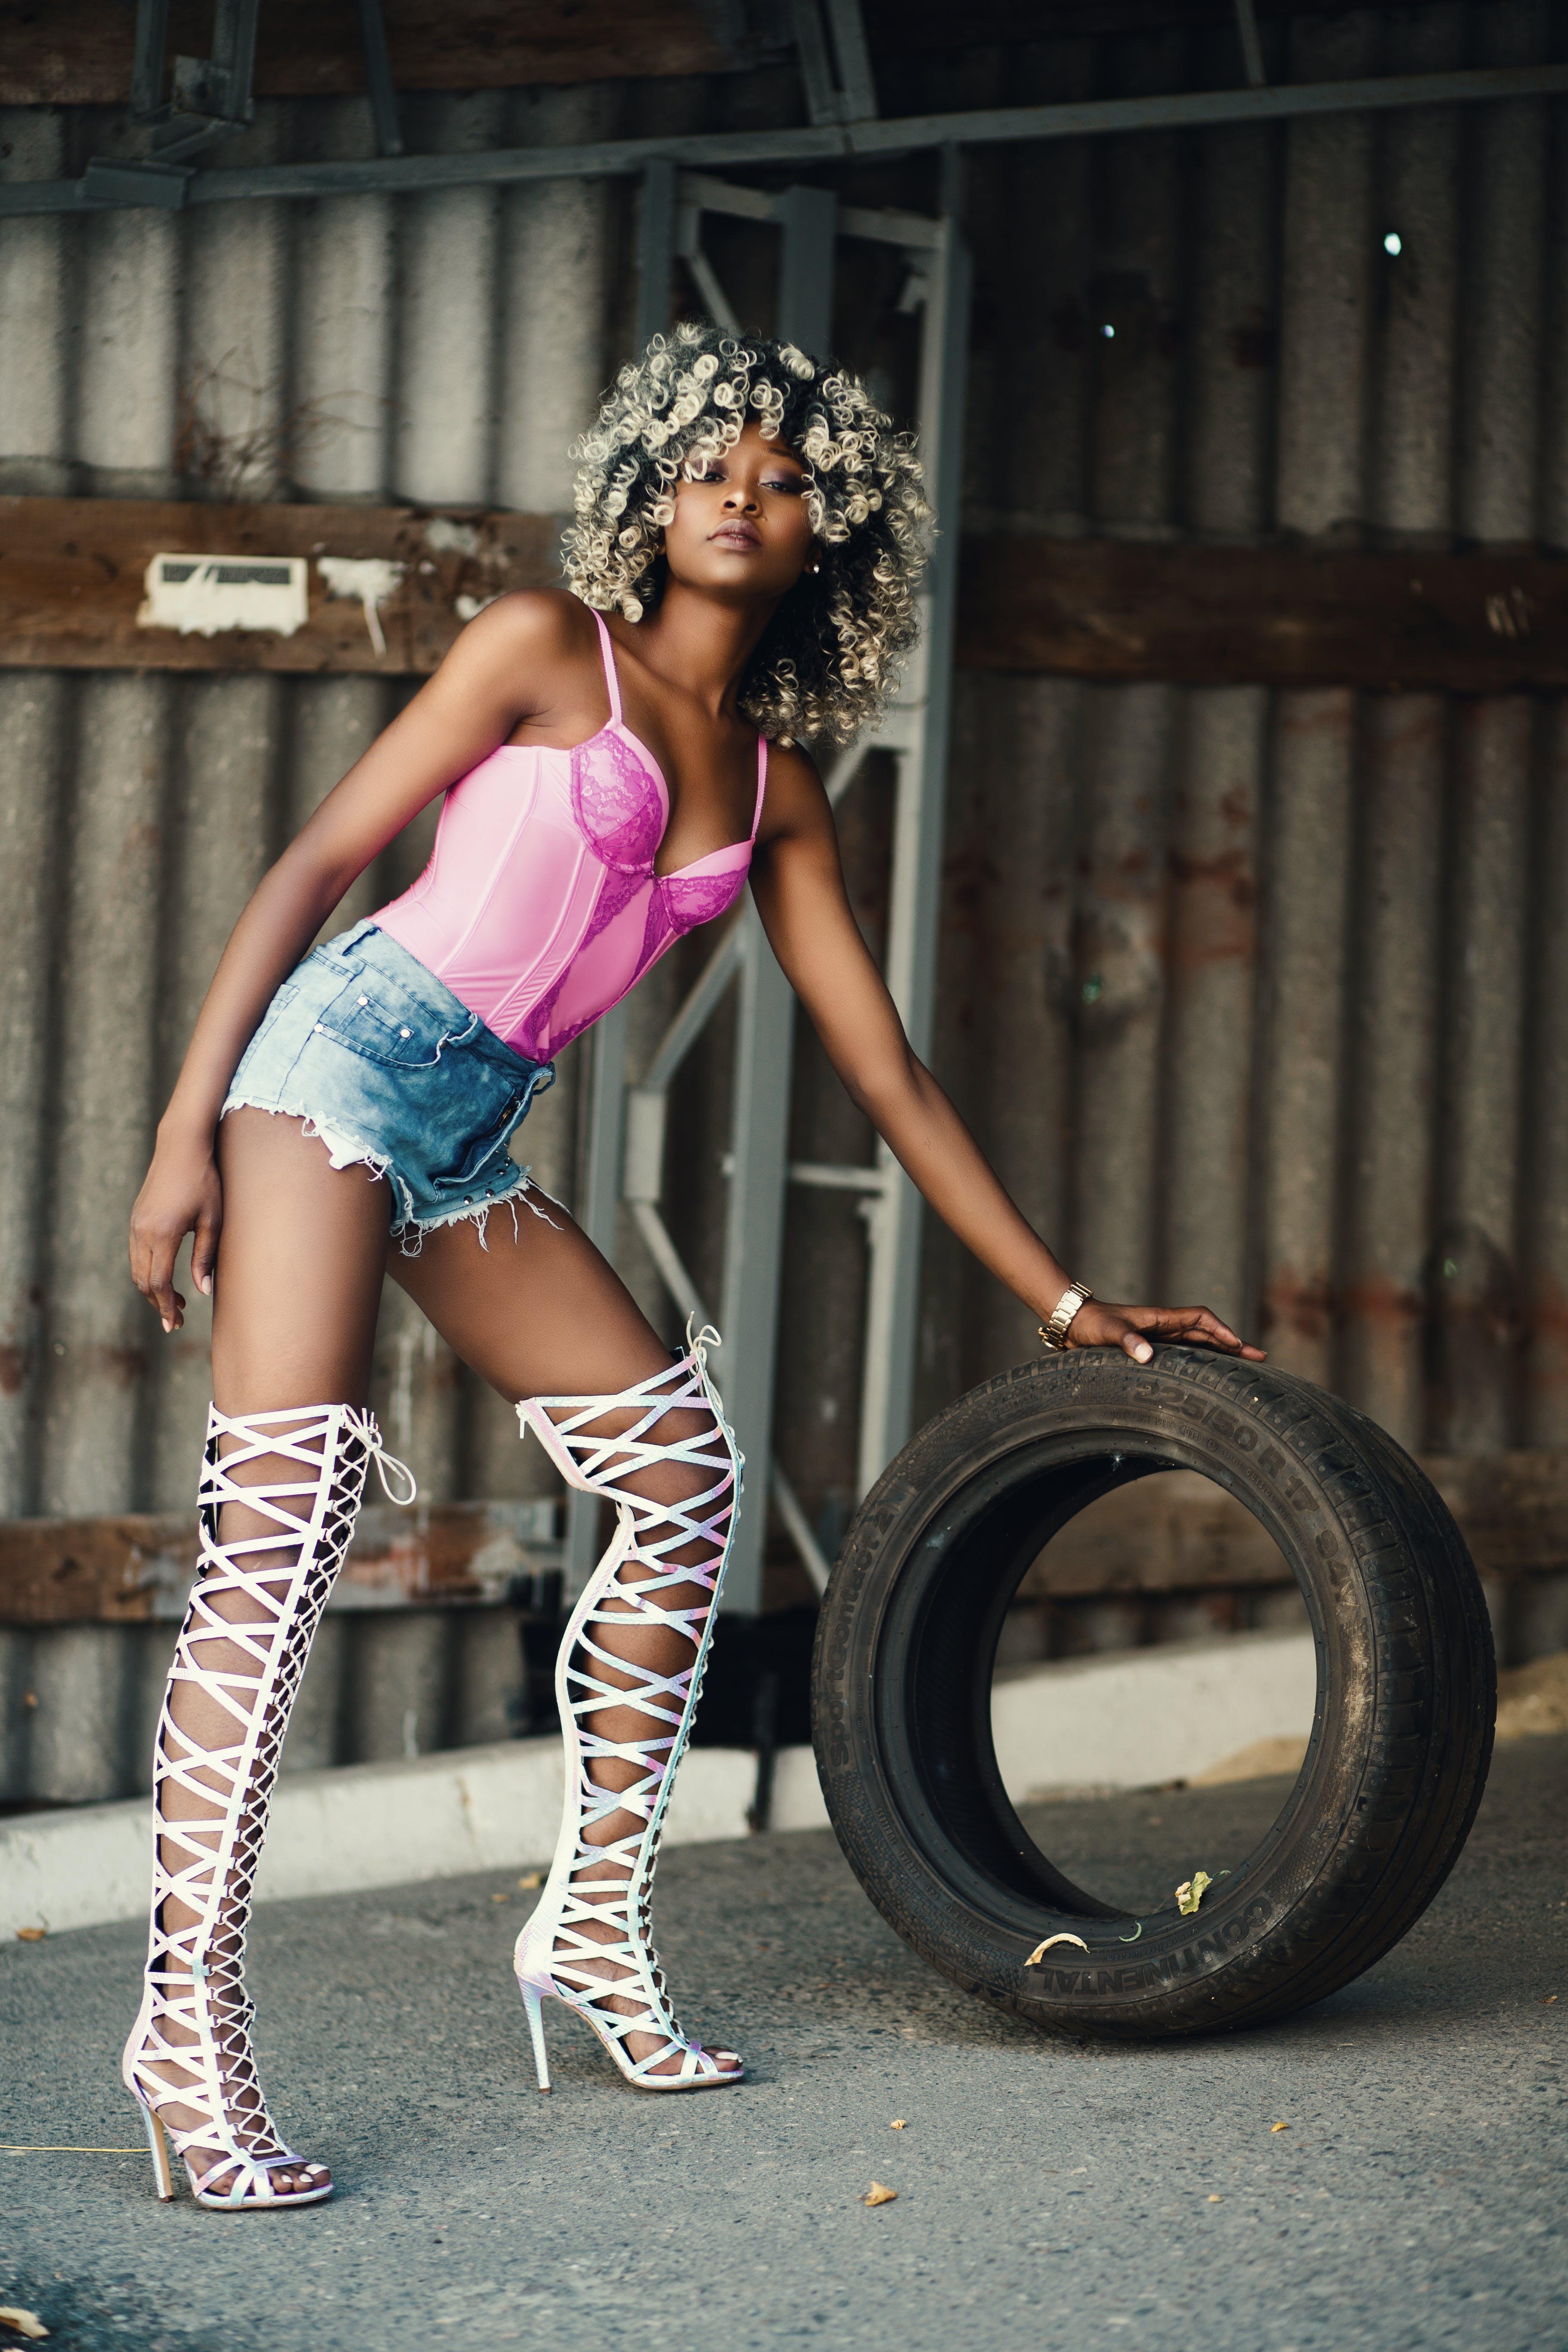 Kostenloses Stock Foto zu afroamerikaner-frau, farbige frau, fashion, fotoshooting